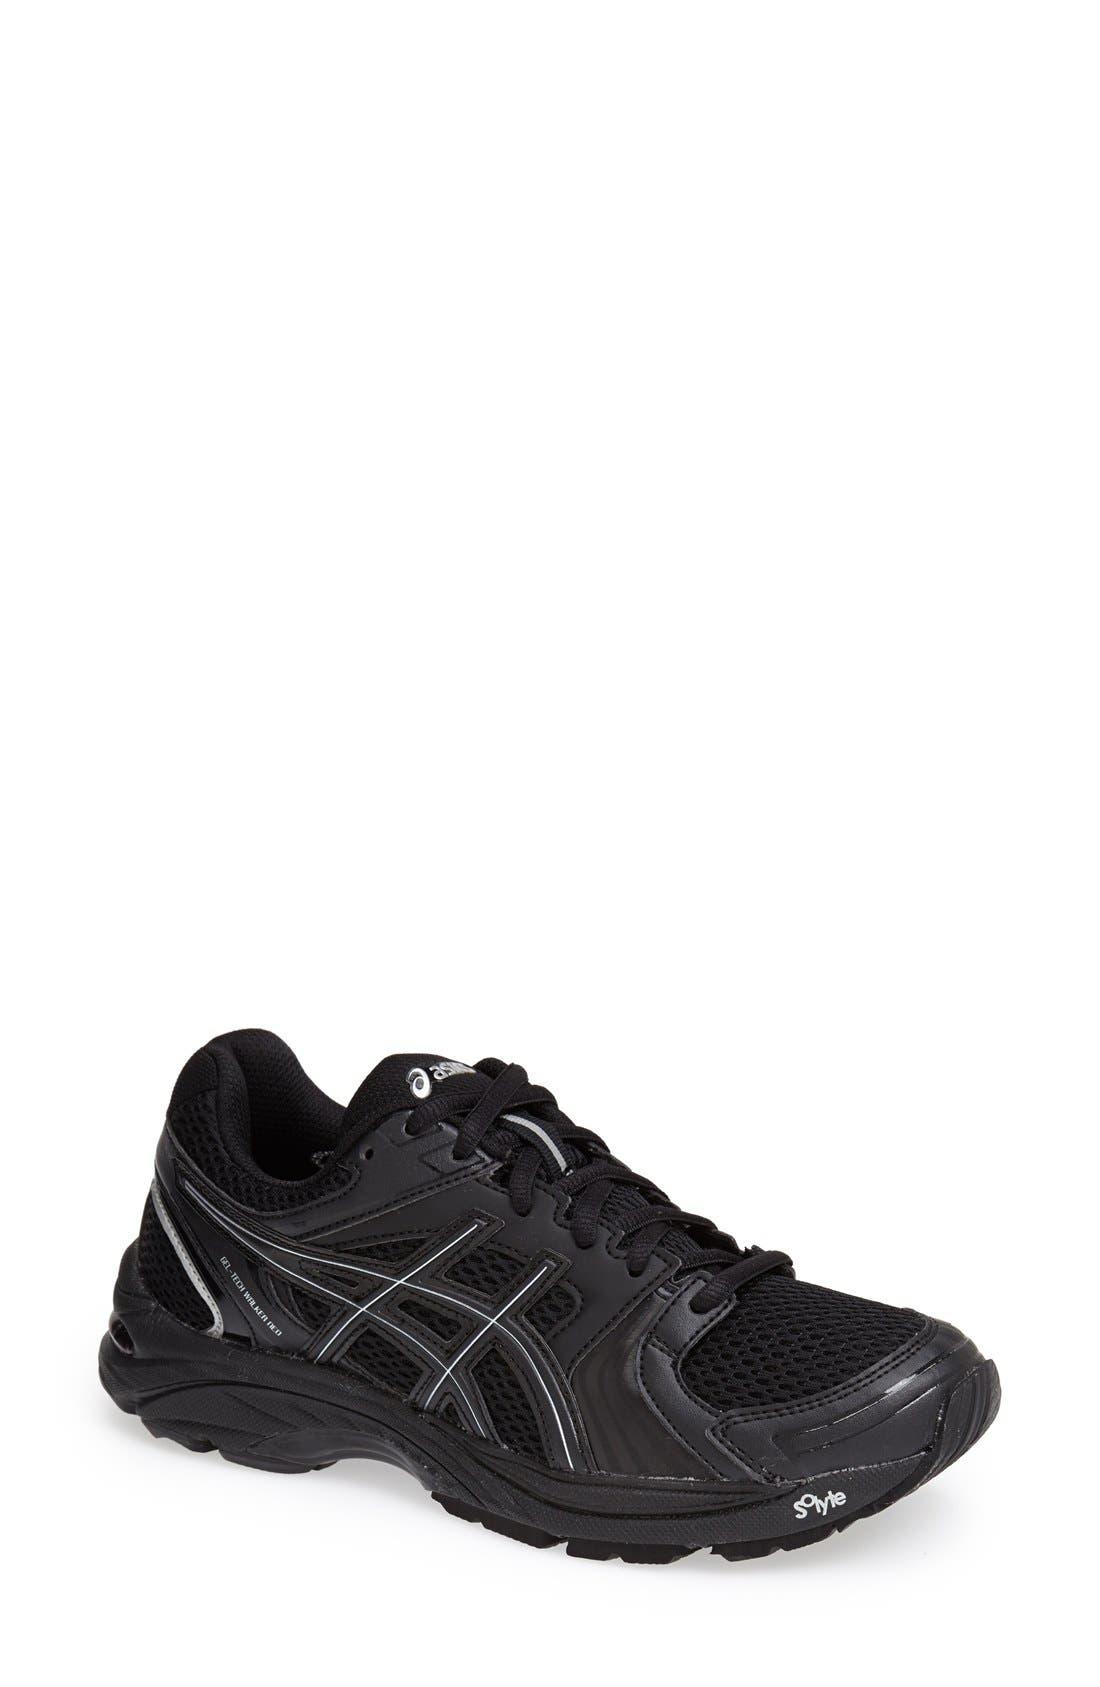 Alternate Image 1 Selected - ASICS® 'GEL-Tech Neo 4' Walking Shoe (Women)